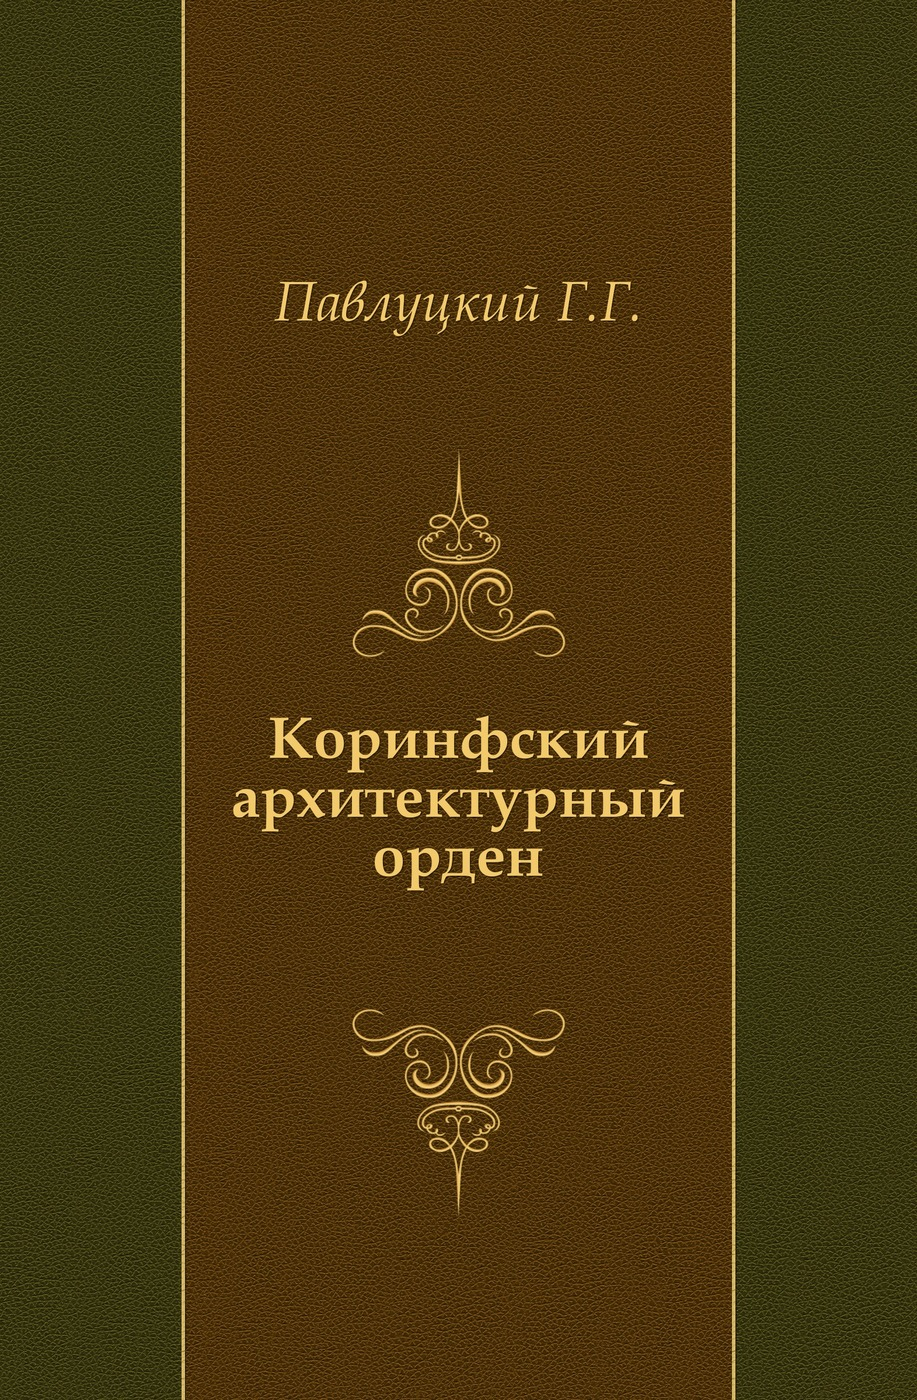 Коринфский архитектурный орден